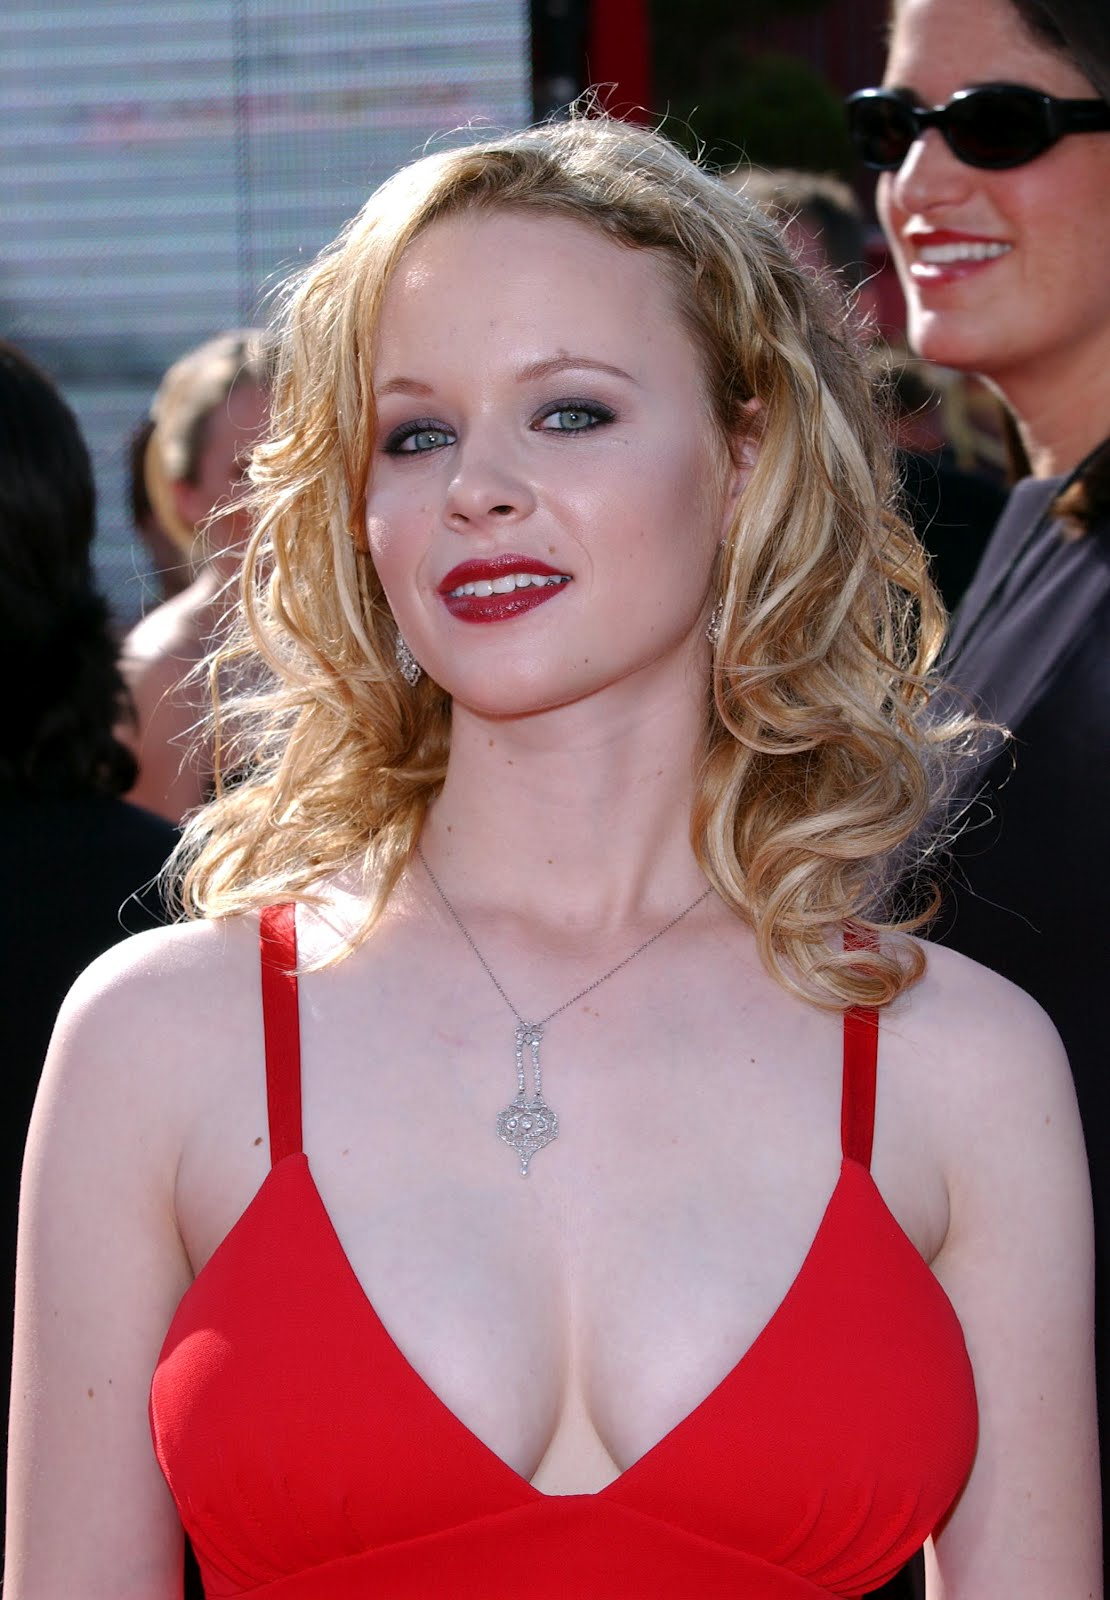 Alice eve nude sex scene in crossing over scandalplanetcom - 2 part 9